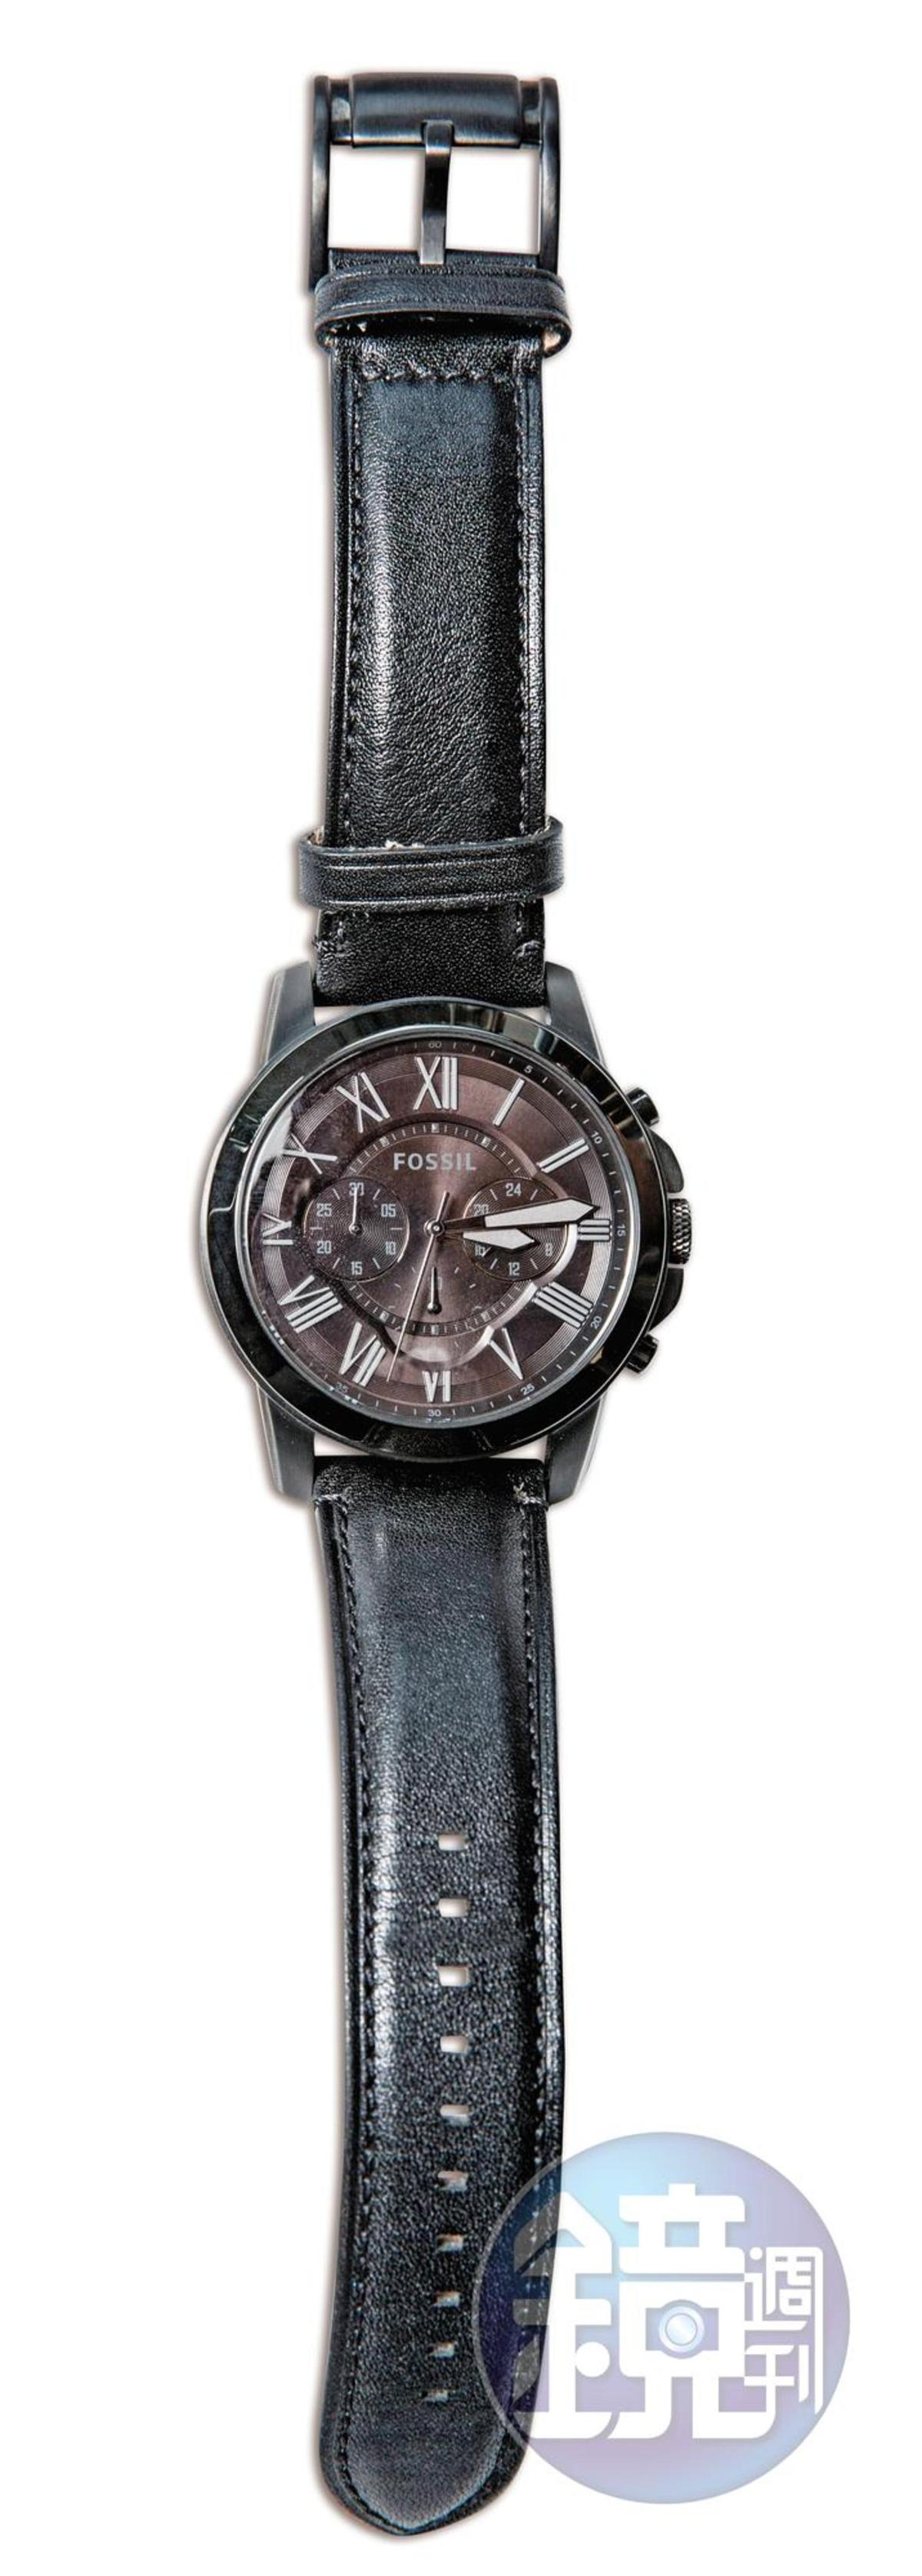 FOSSIL手錶,是跟爸爸借來戴的,不知道價錢。